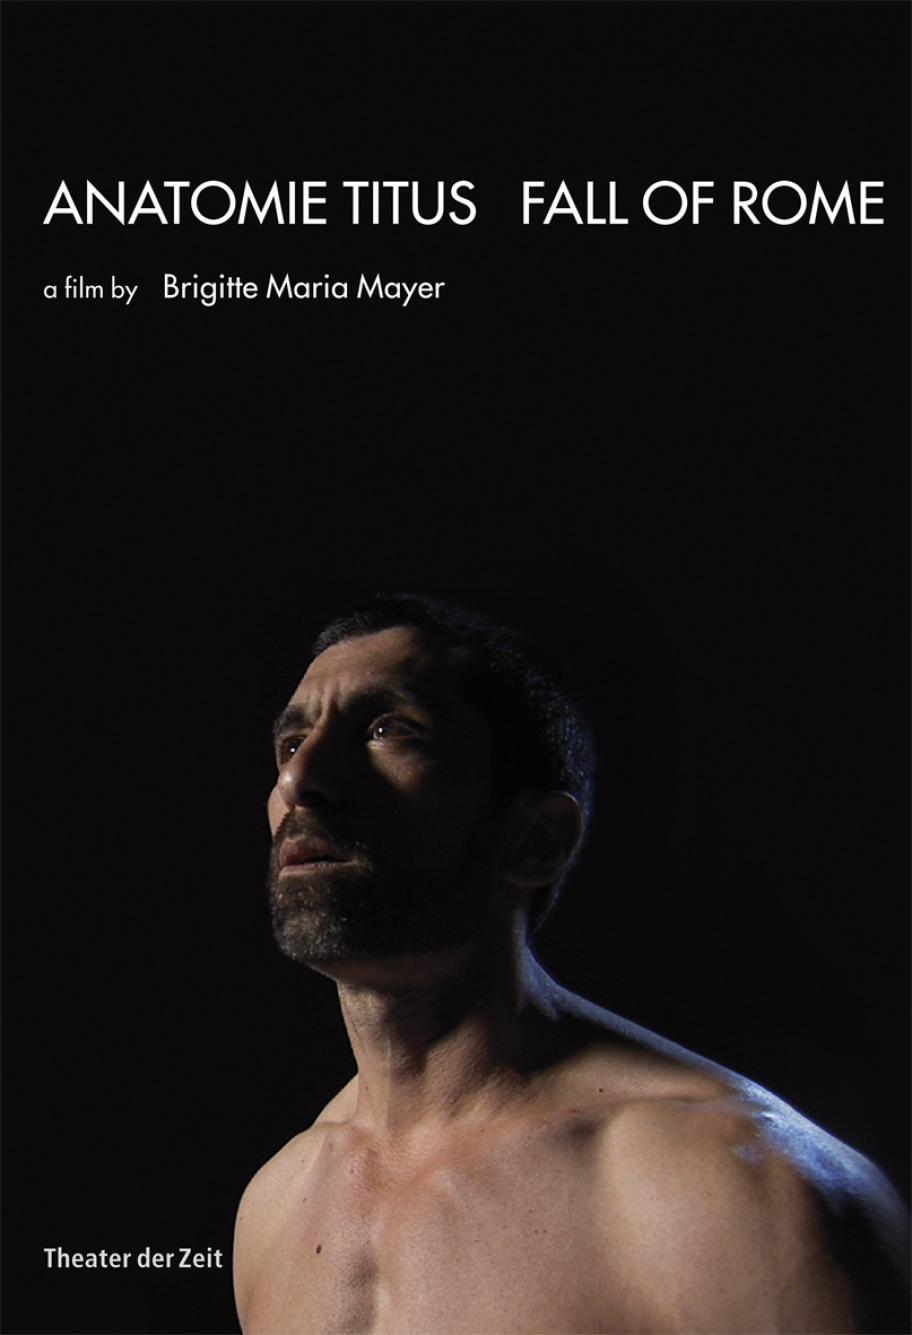 """Anatomie Titus - Fall of Rome"""